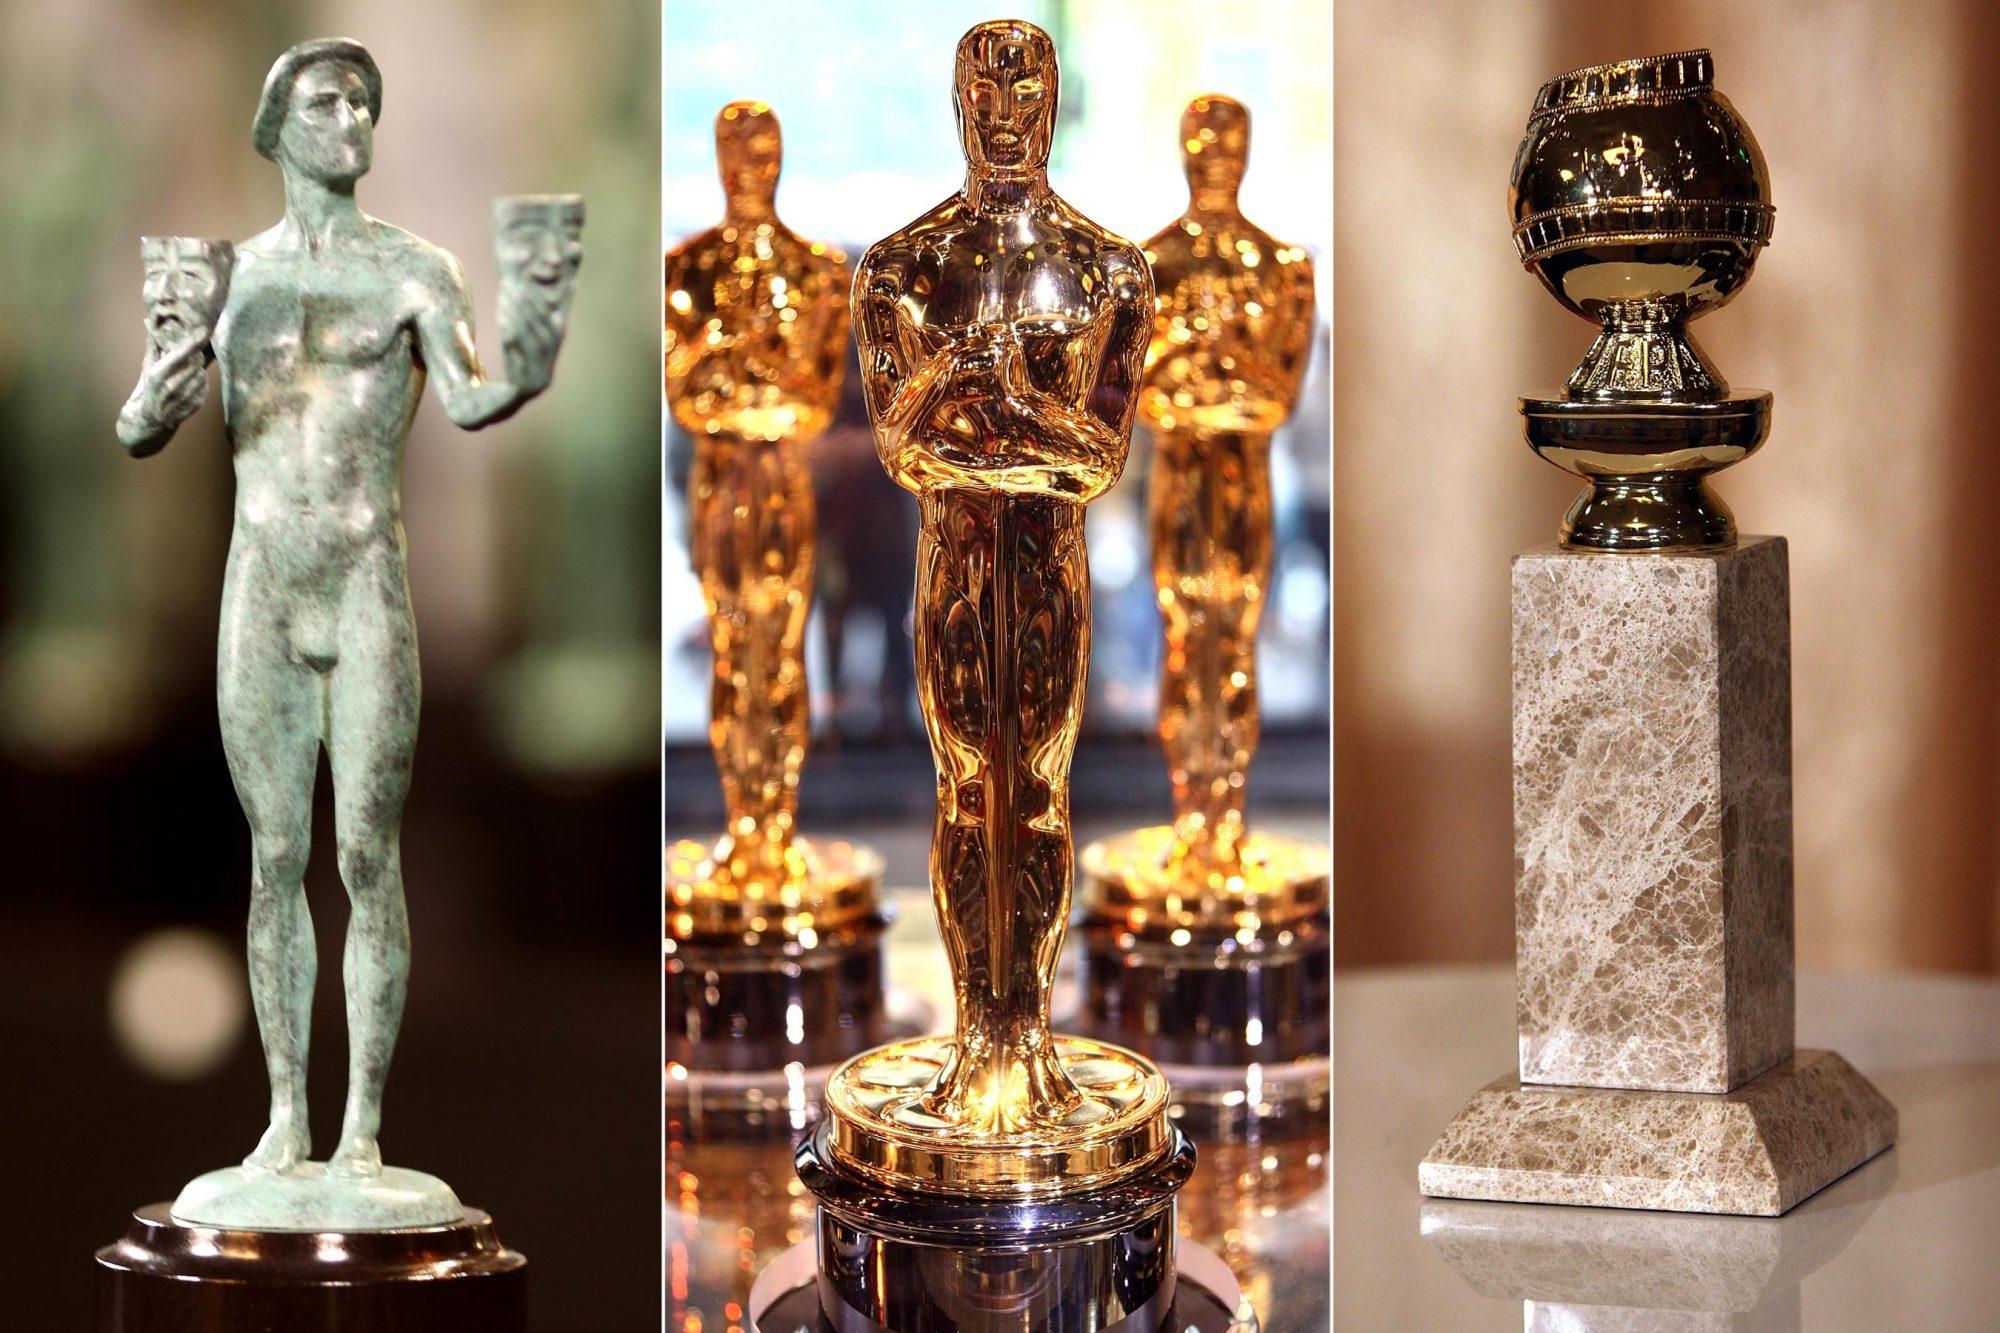 2019 2020 Awards Season Calendar Timeline Key Oscars Dates Ew Com